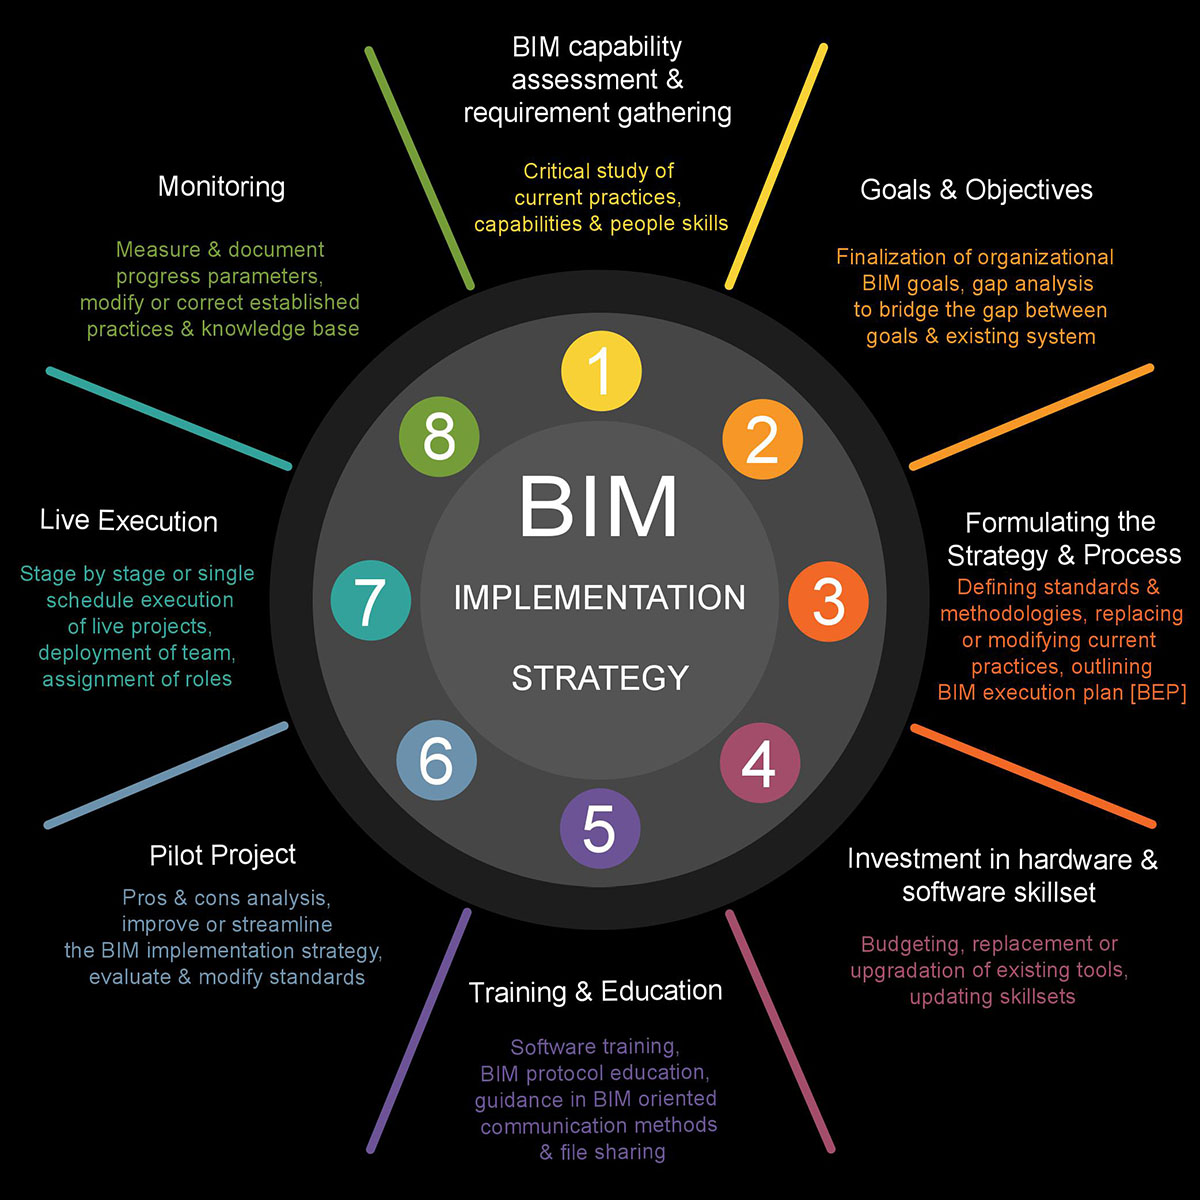 BIM Implementation Strategy